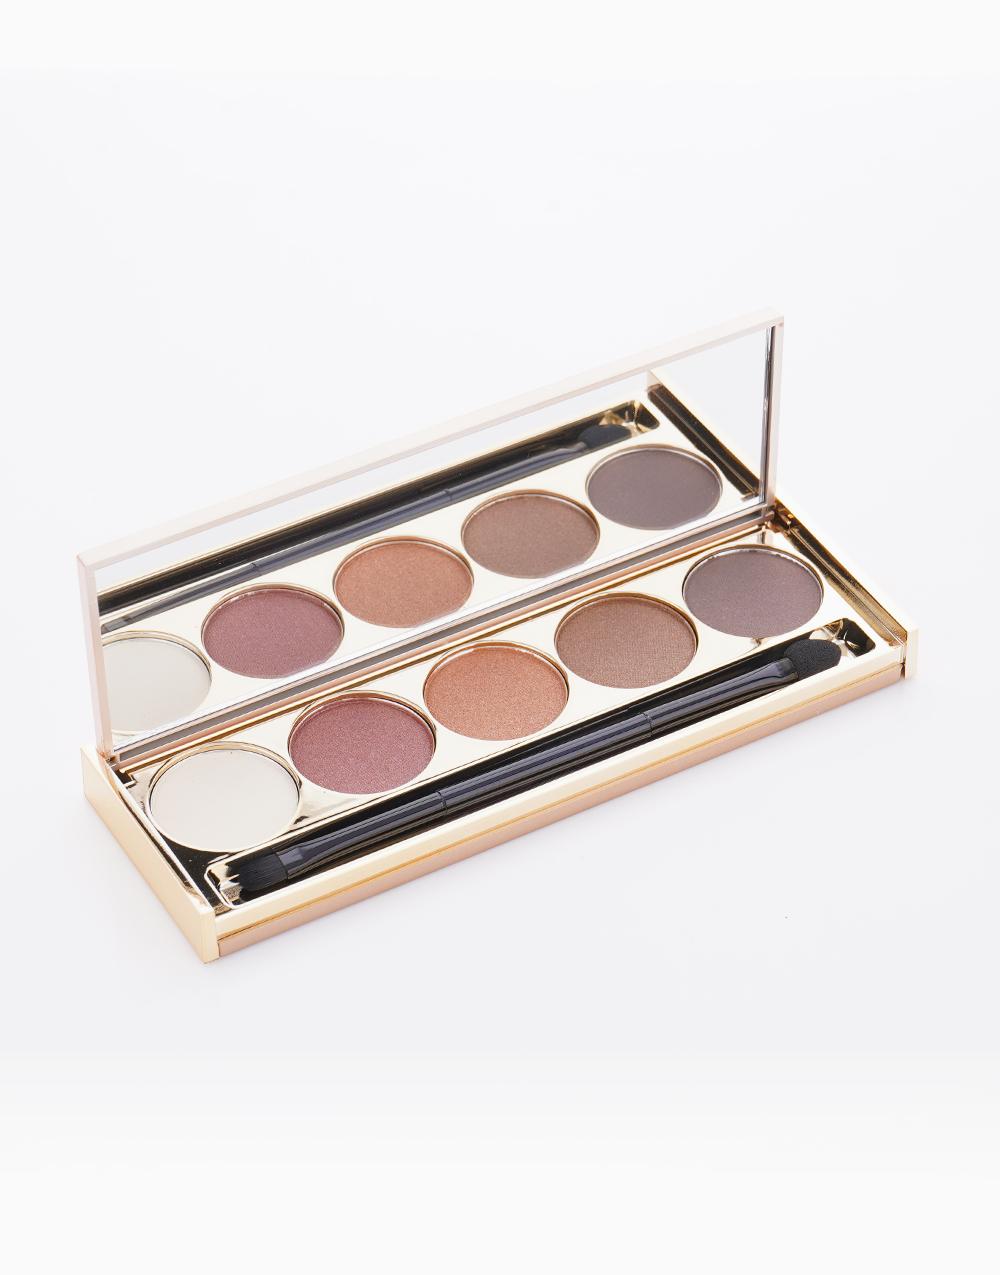 FS Filipiñana Eyeshadow Palette by FS Features & Shades | Minamahal